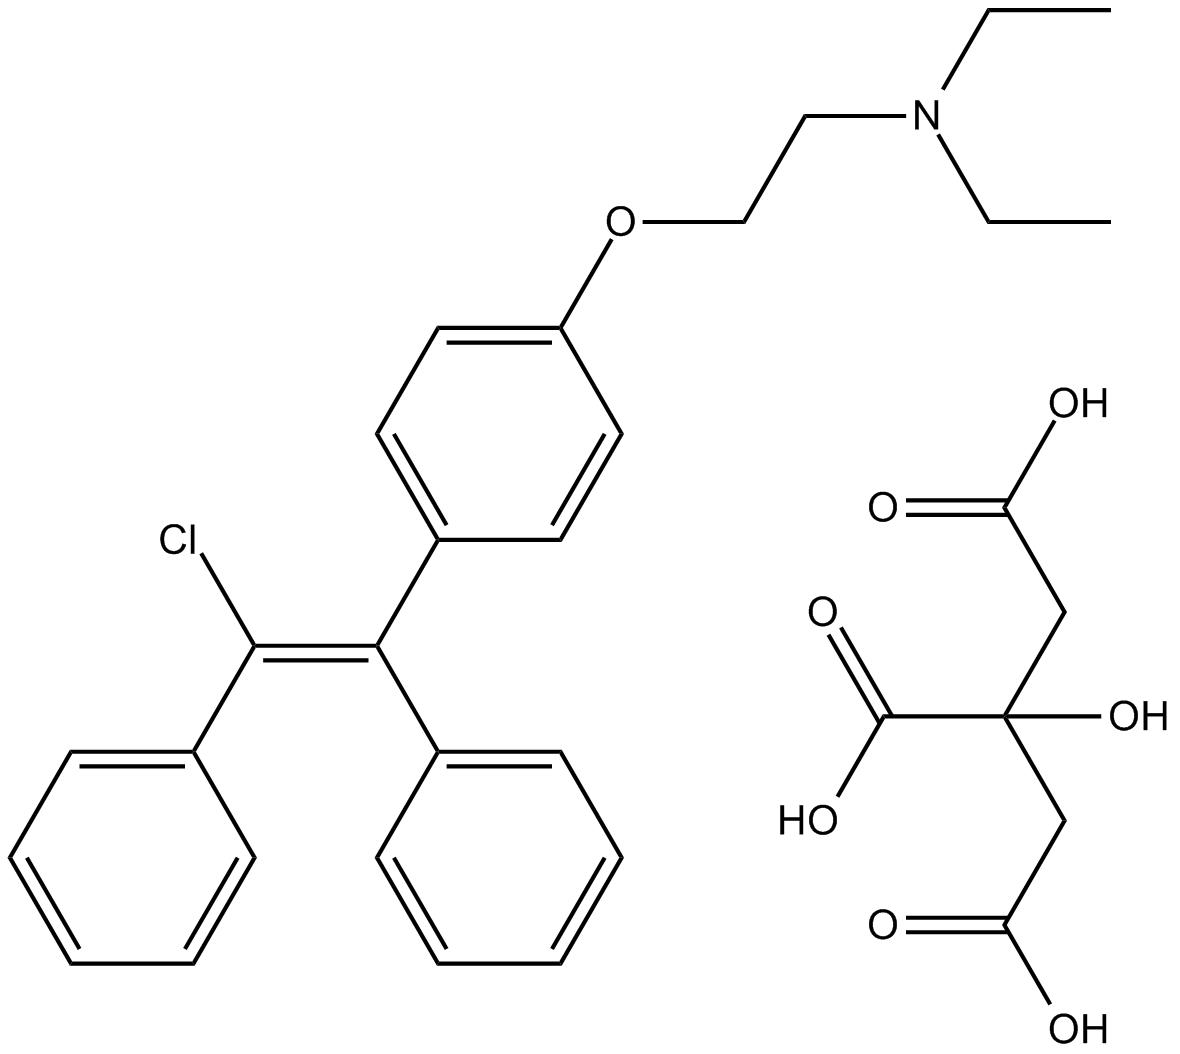 estrogen and progesterone receptor assay